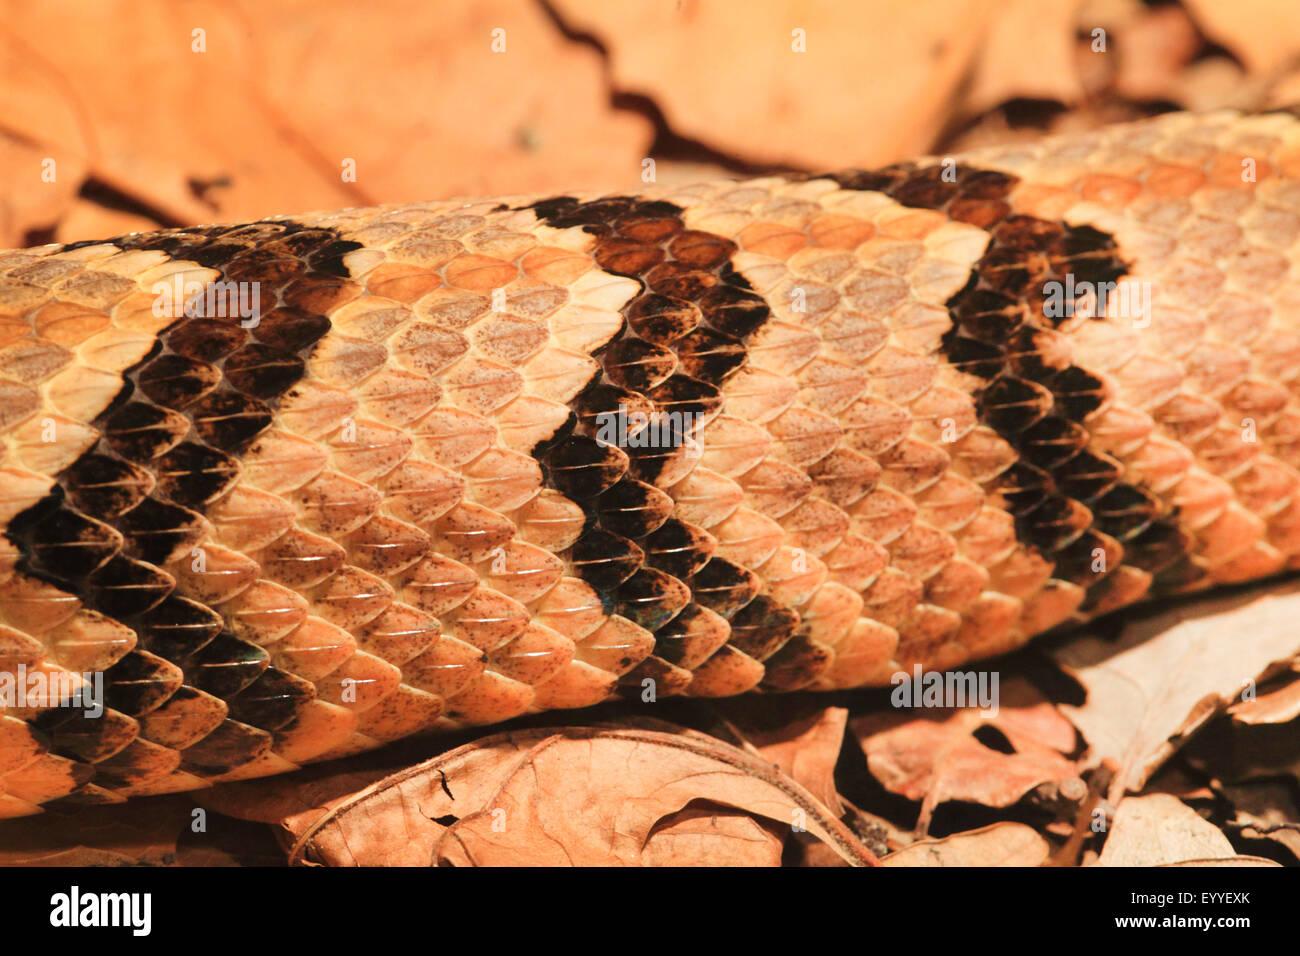 timber rattlesnake (Crotalus horridus), detail of colouration - Stock Image